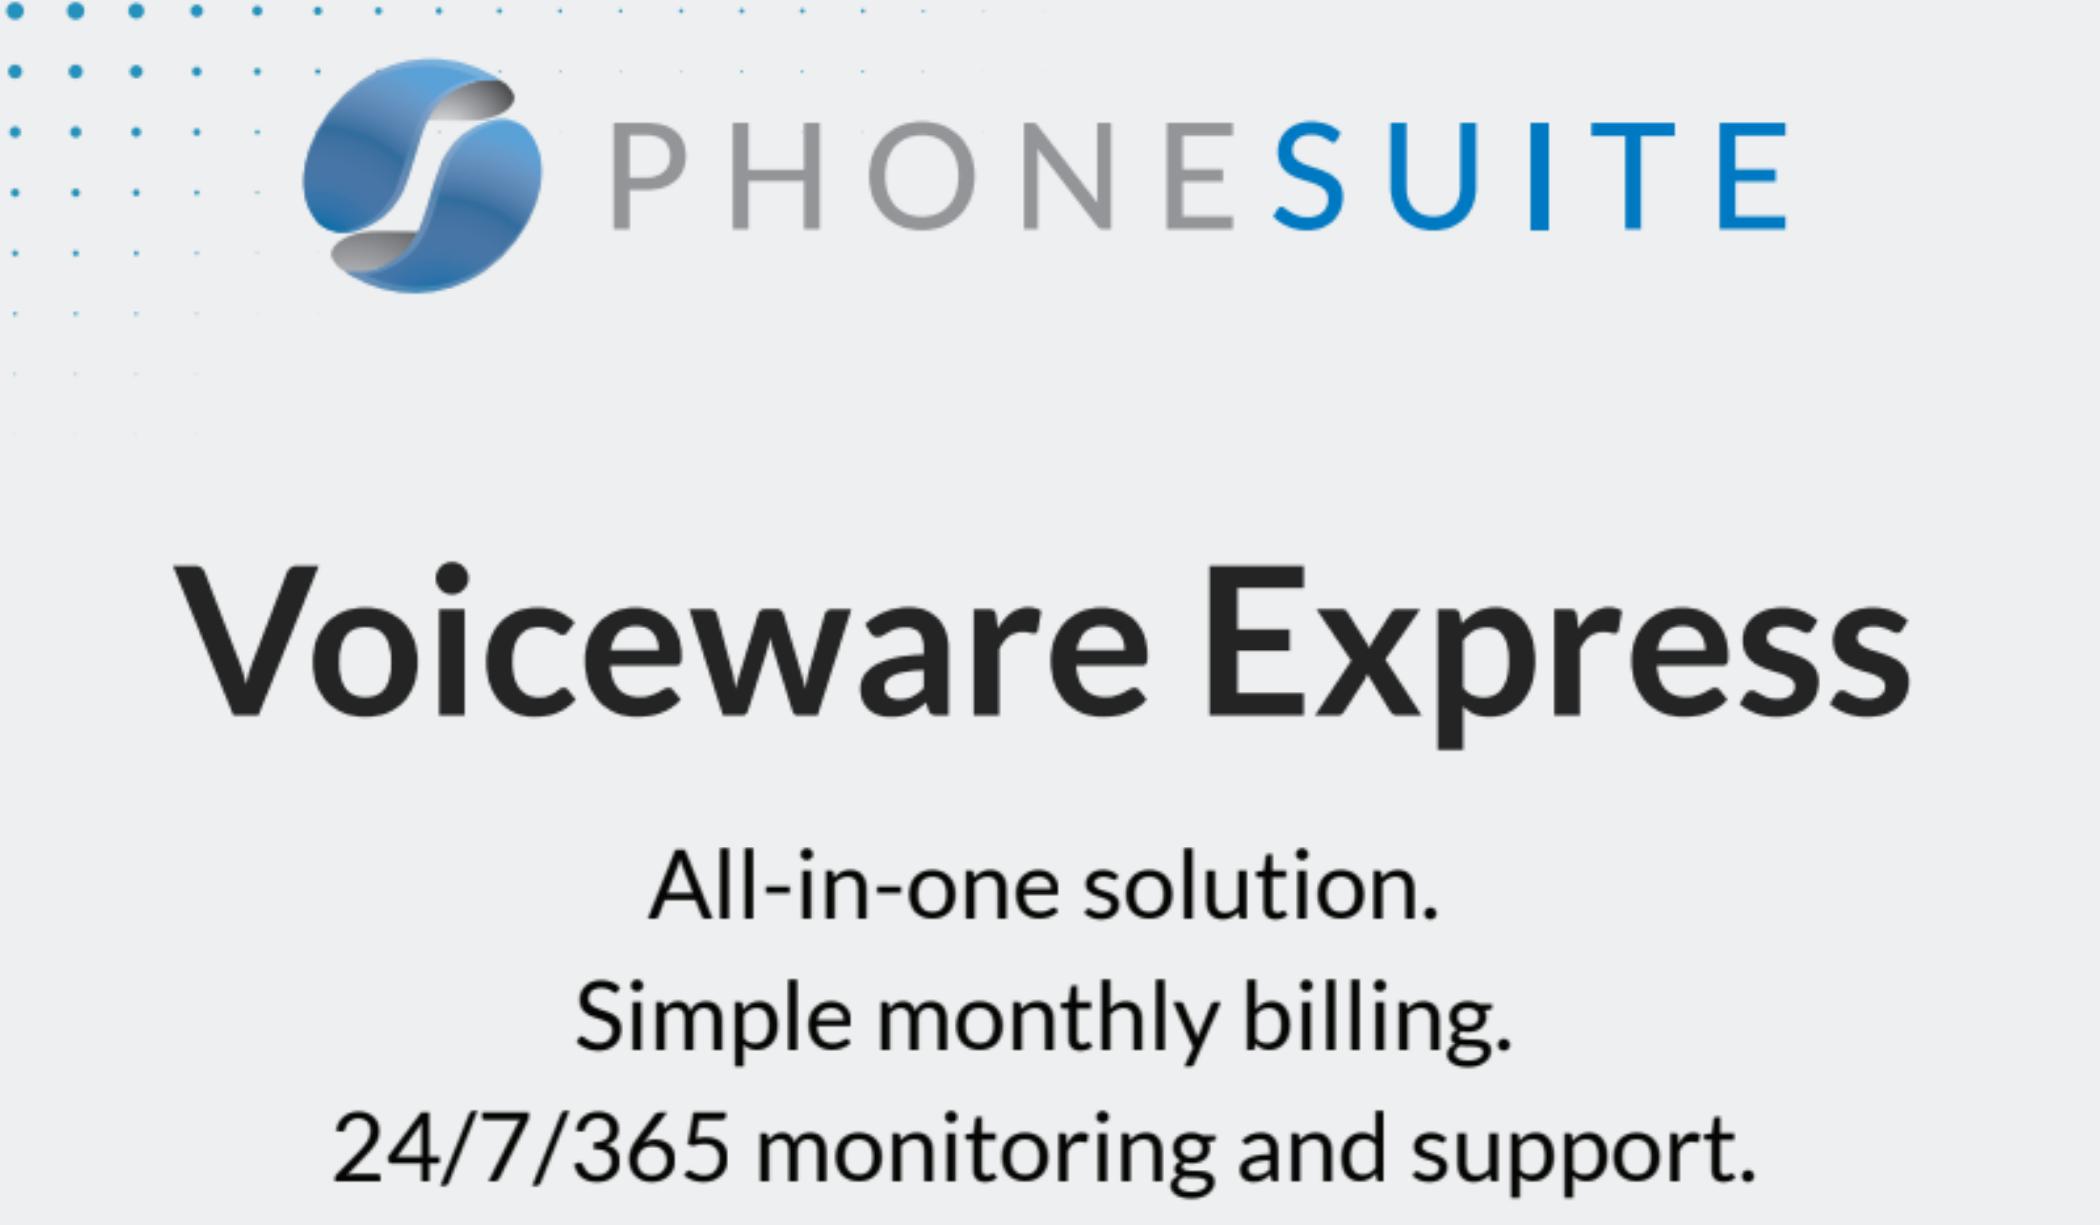 Voiceware Express Press Release